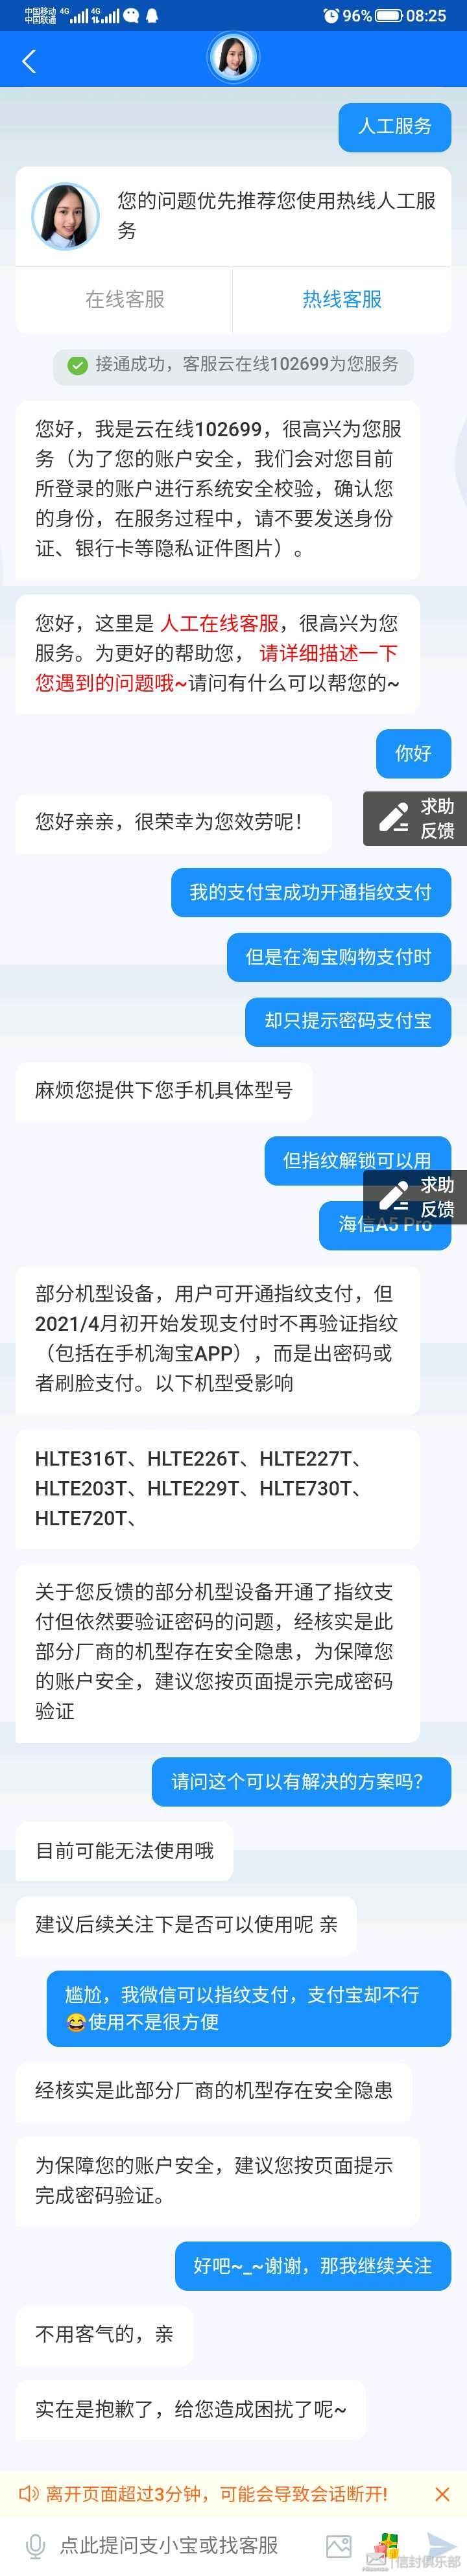 Screenshot_20210422_082549284_支付宝.jpg